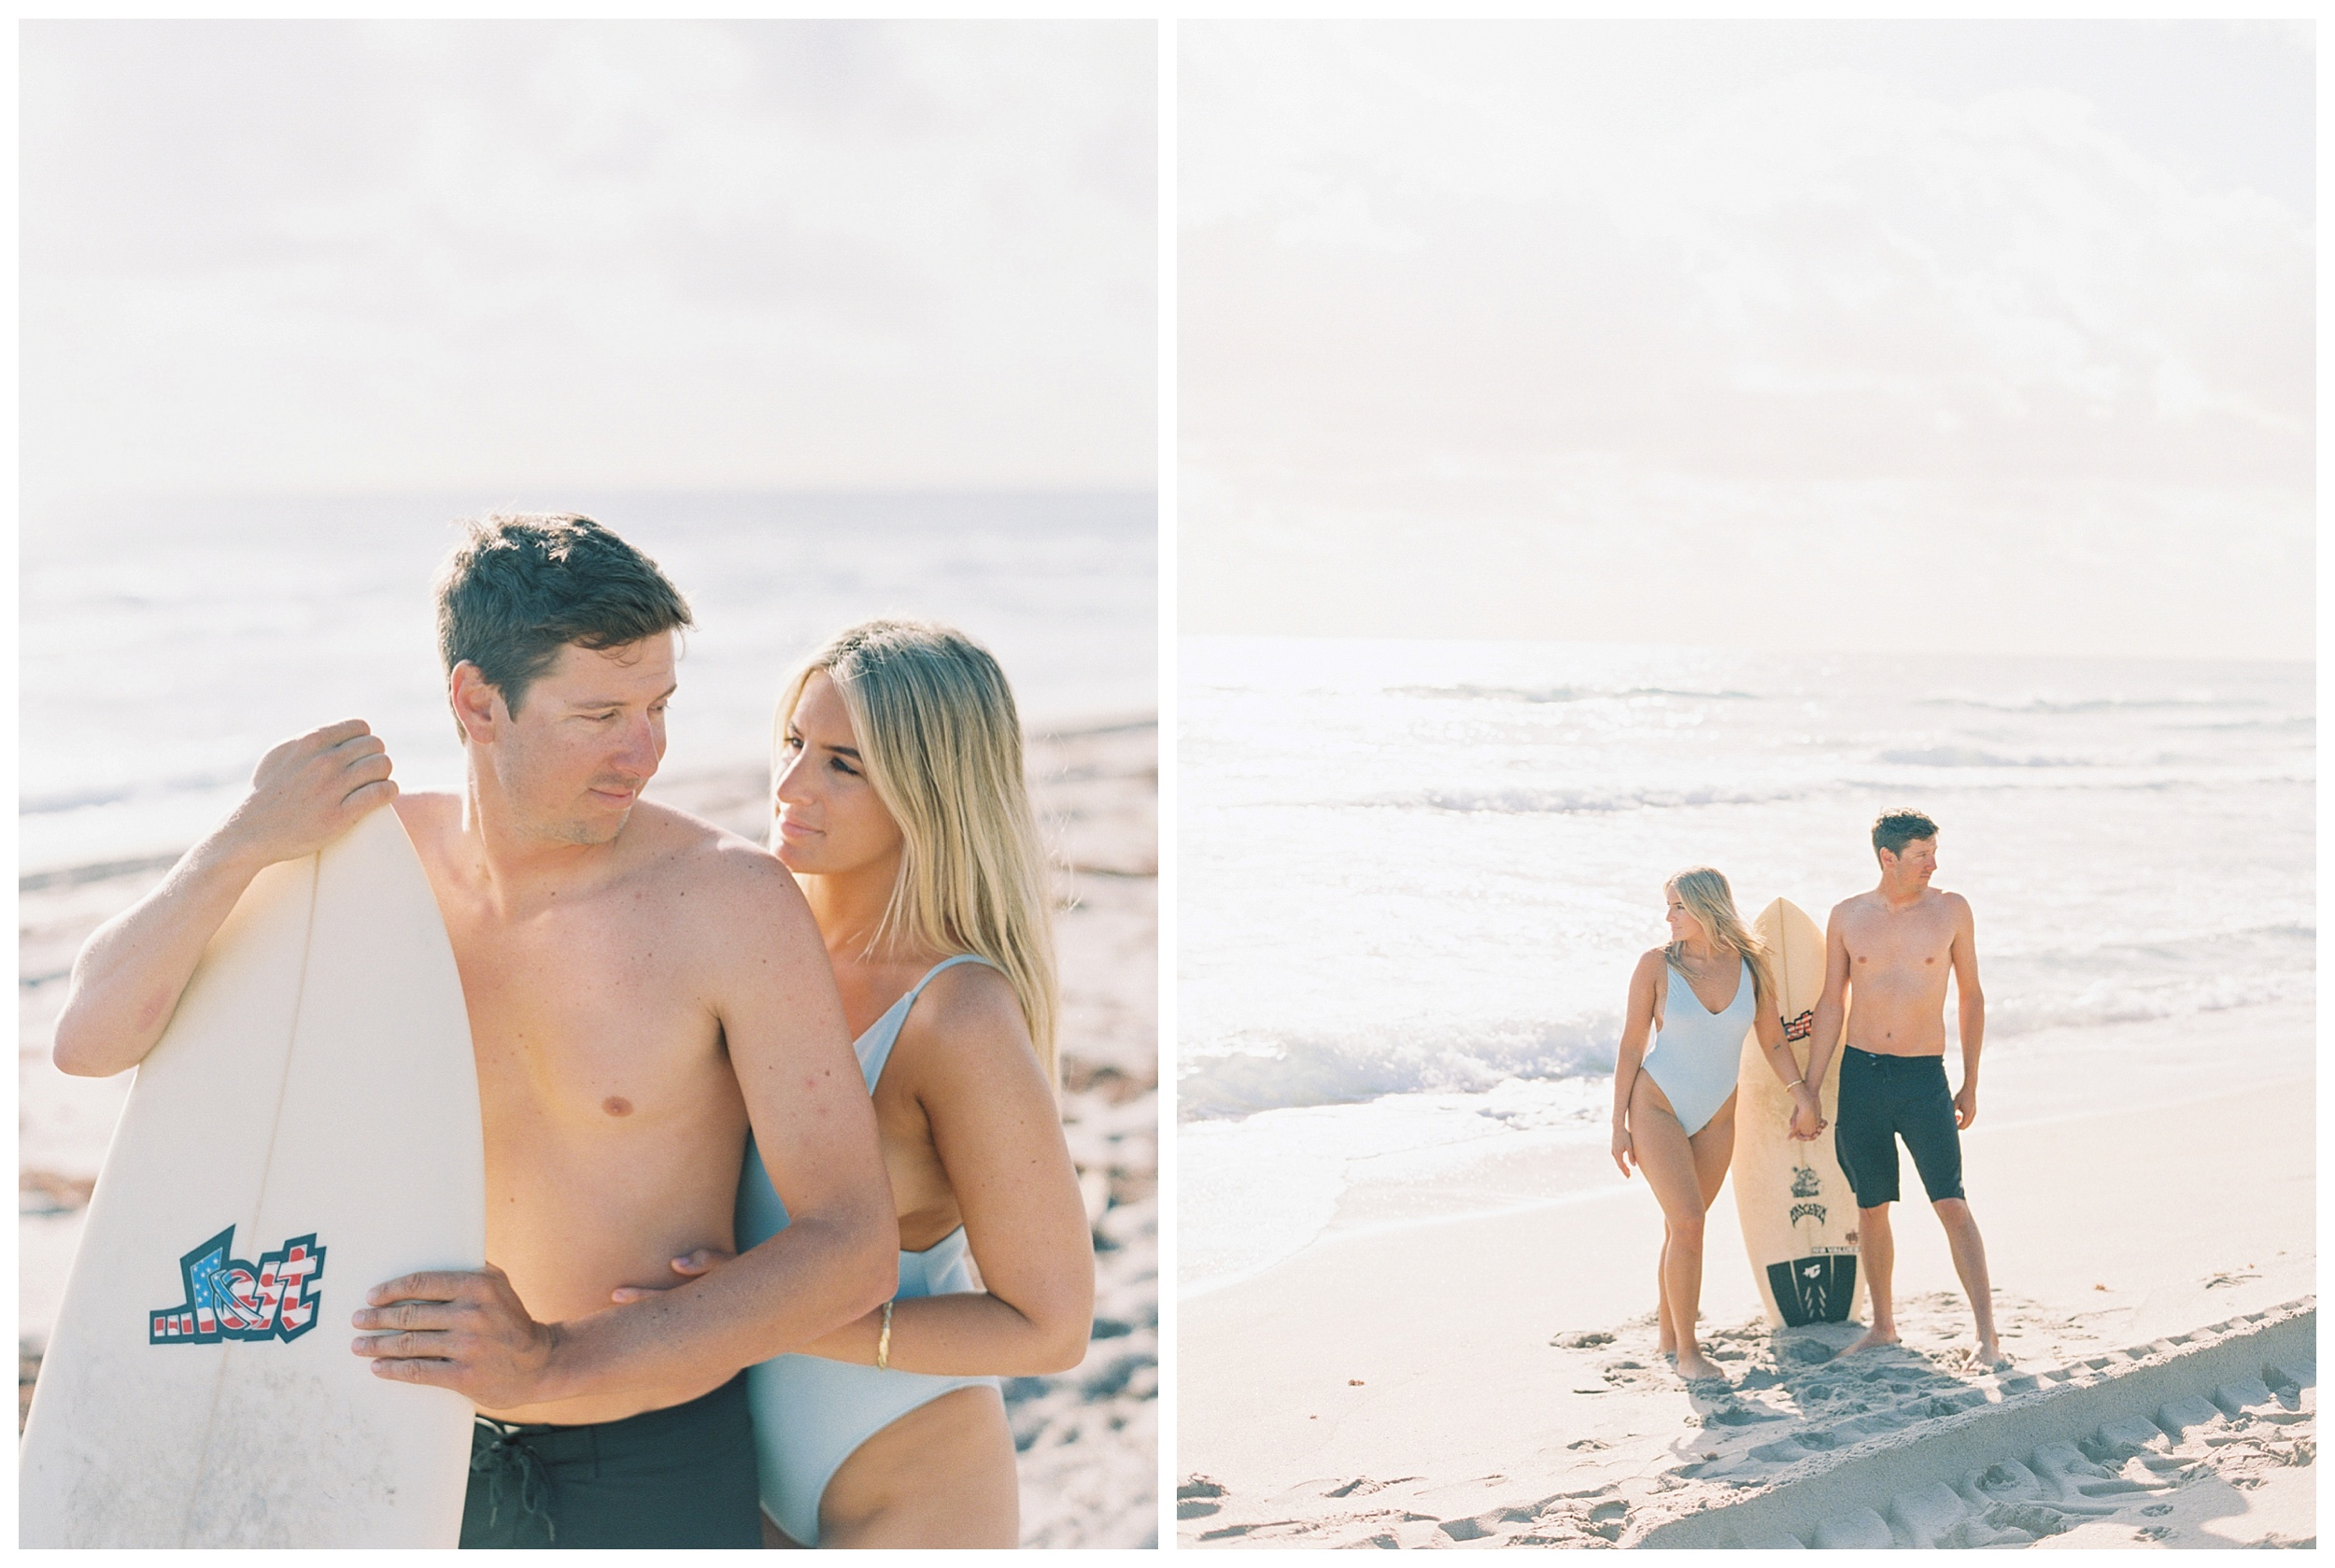 Surfboard Engagement Florida Wedding Photographer Kir Tuben_0034.jpg